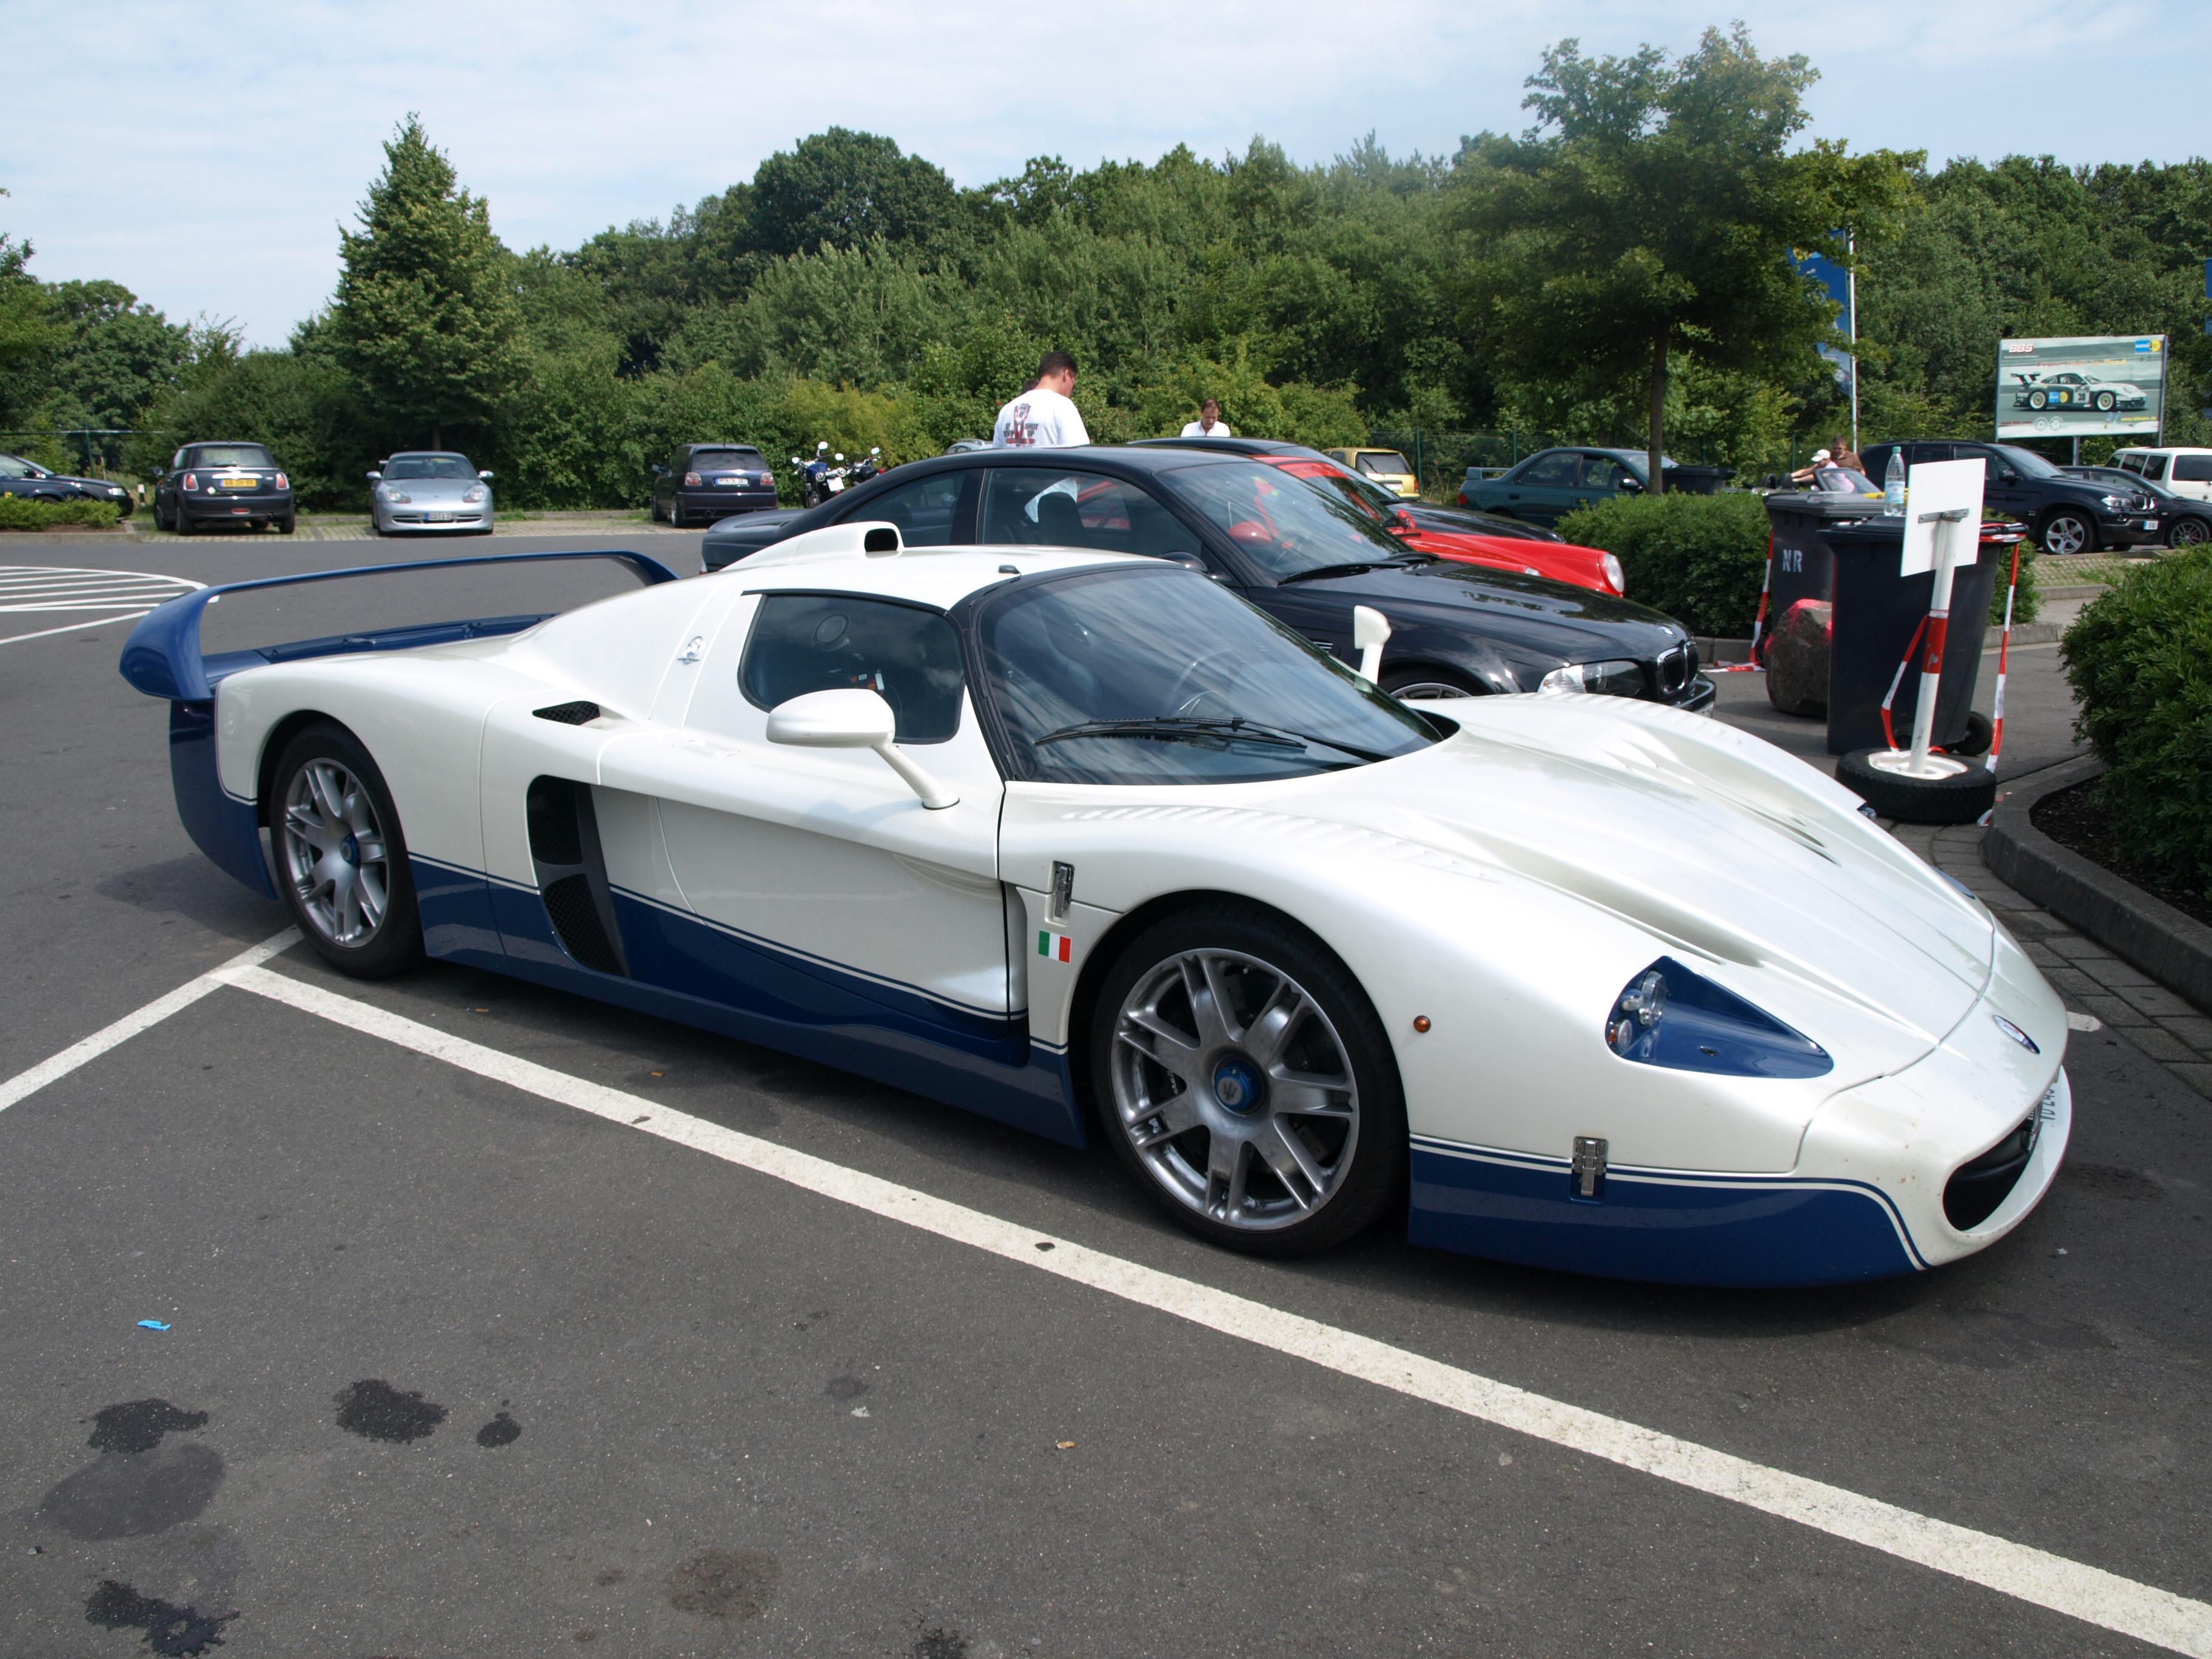 2008 Corvette For Sale >> File:Maserati MC12 1.jpg - Wikimedia Commons